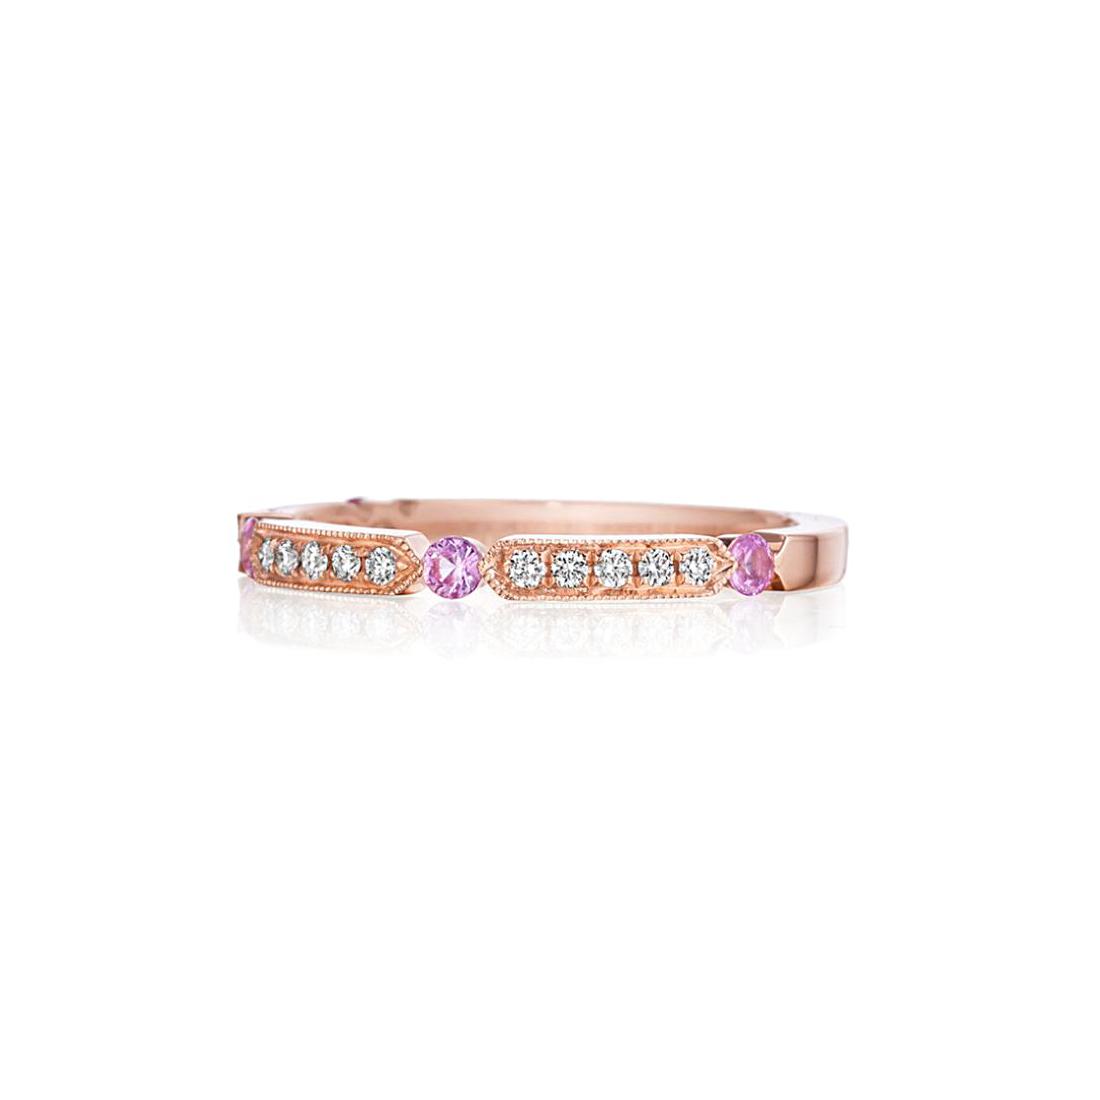 Henri Daussi 14 Karat Rose Gold Pink Sapphire and Diamond Band